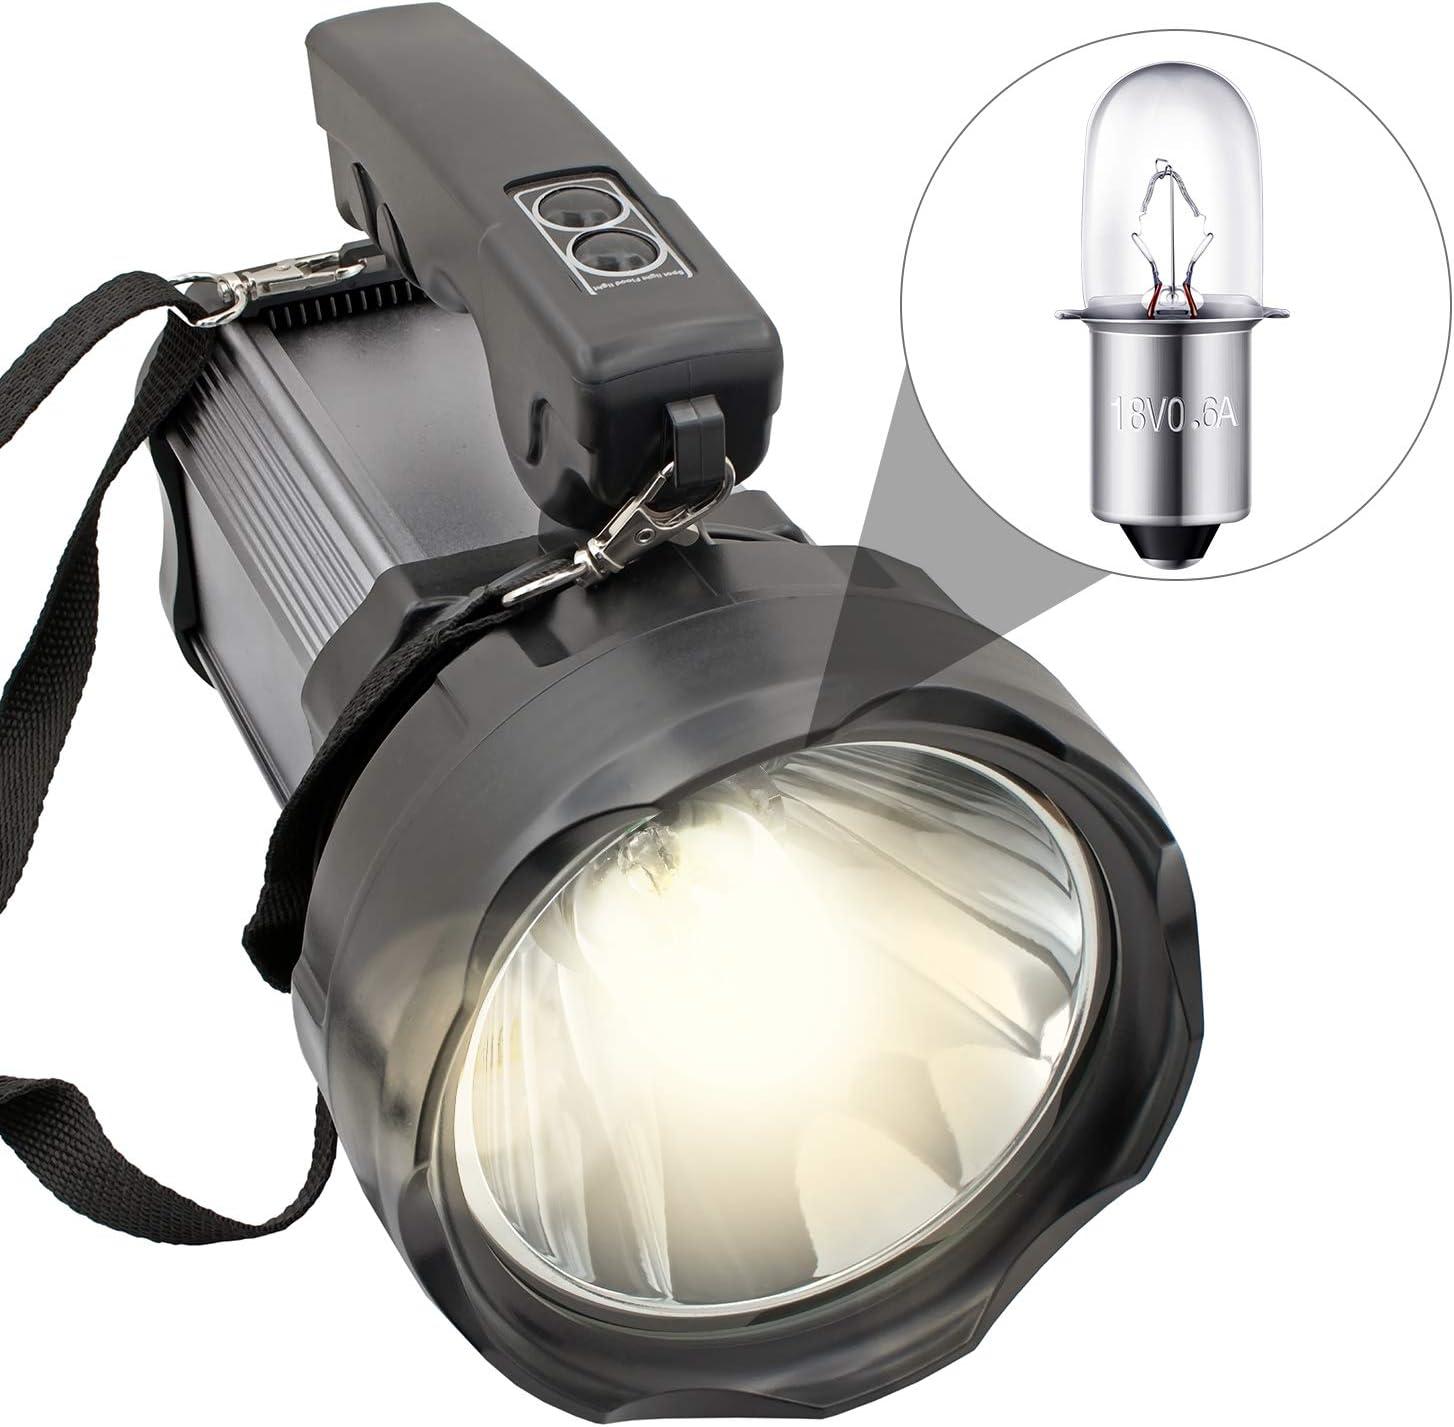 8 Packs 780287001 Flashlight Bulbs Flashlight Replacement Bulbs Compatible with Ryobi Ridgid 18V Flashlight P704 P703 P700